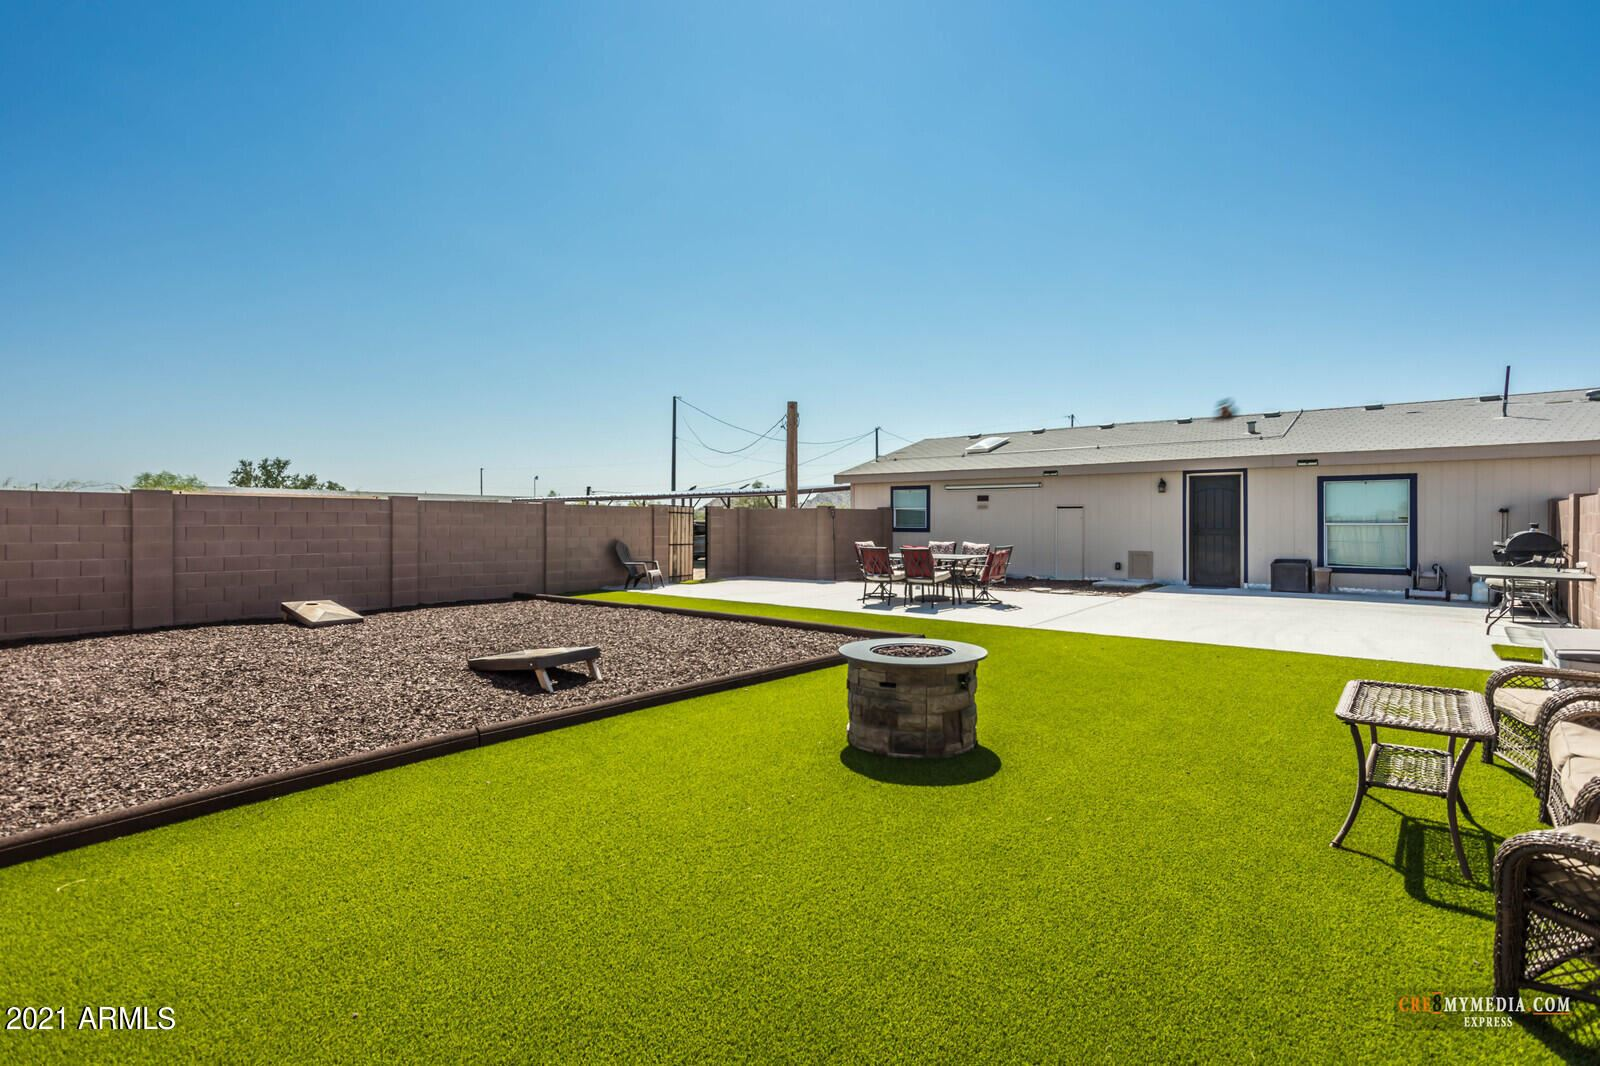 Photo of 51426 W SOTOL Road, Maricopa, AZ 85139 (MLS # 6294450)